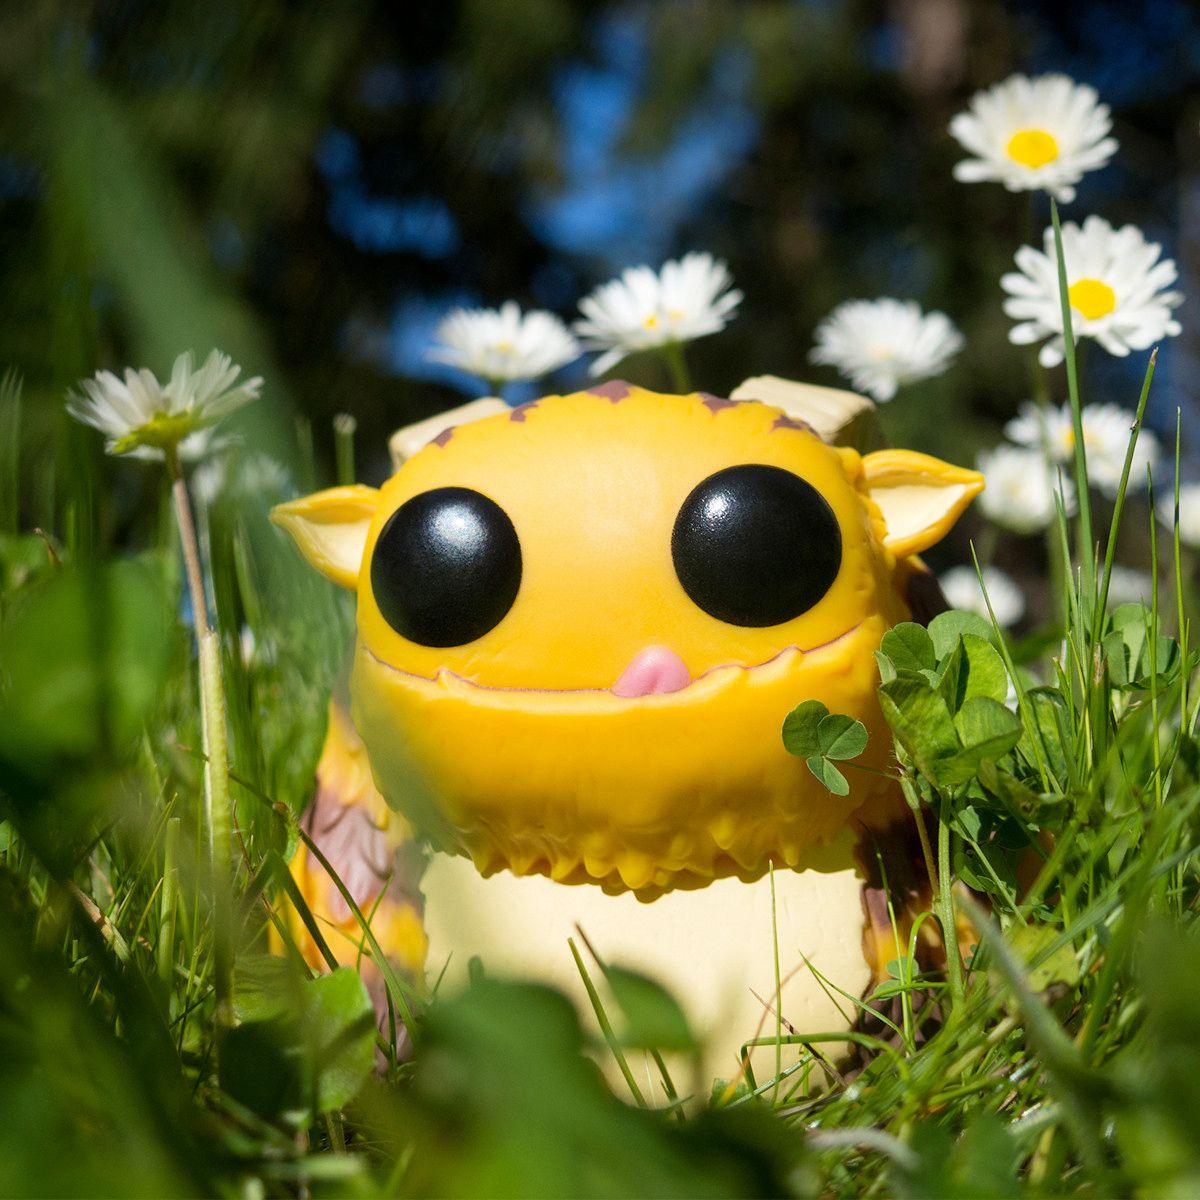 Boneco-Pop-Monsters-Tumblebee-03